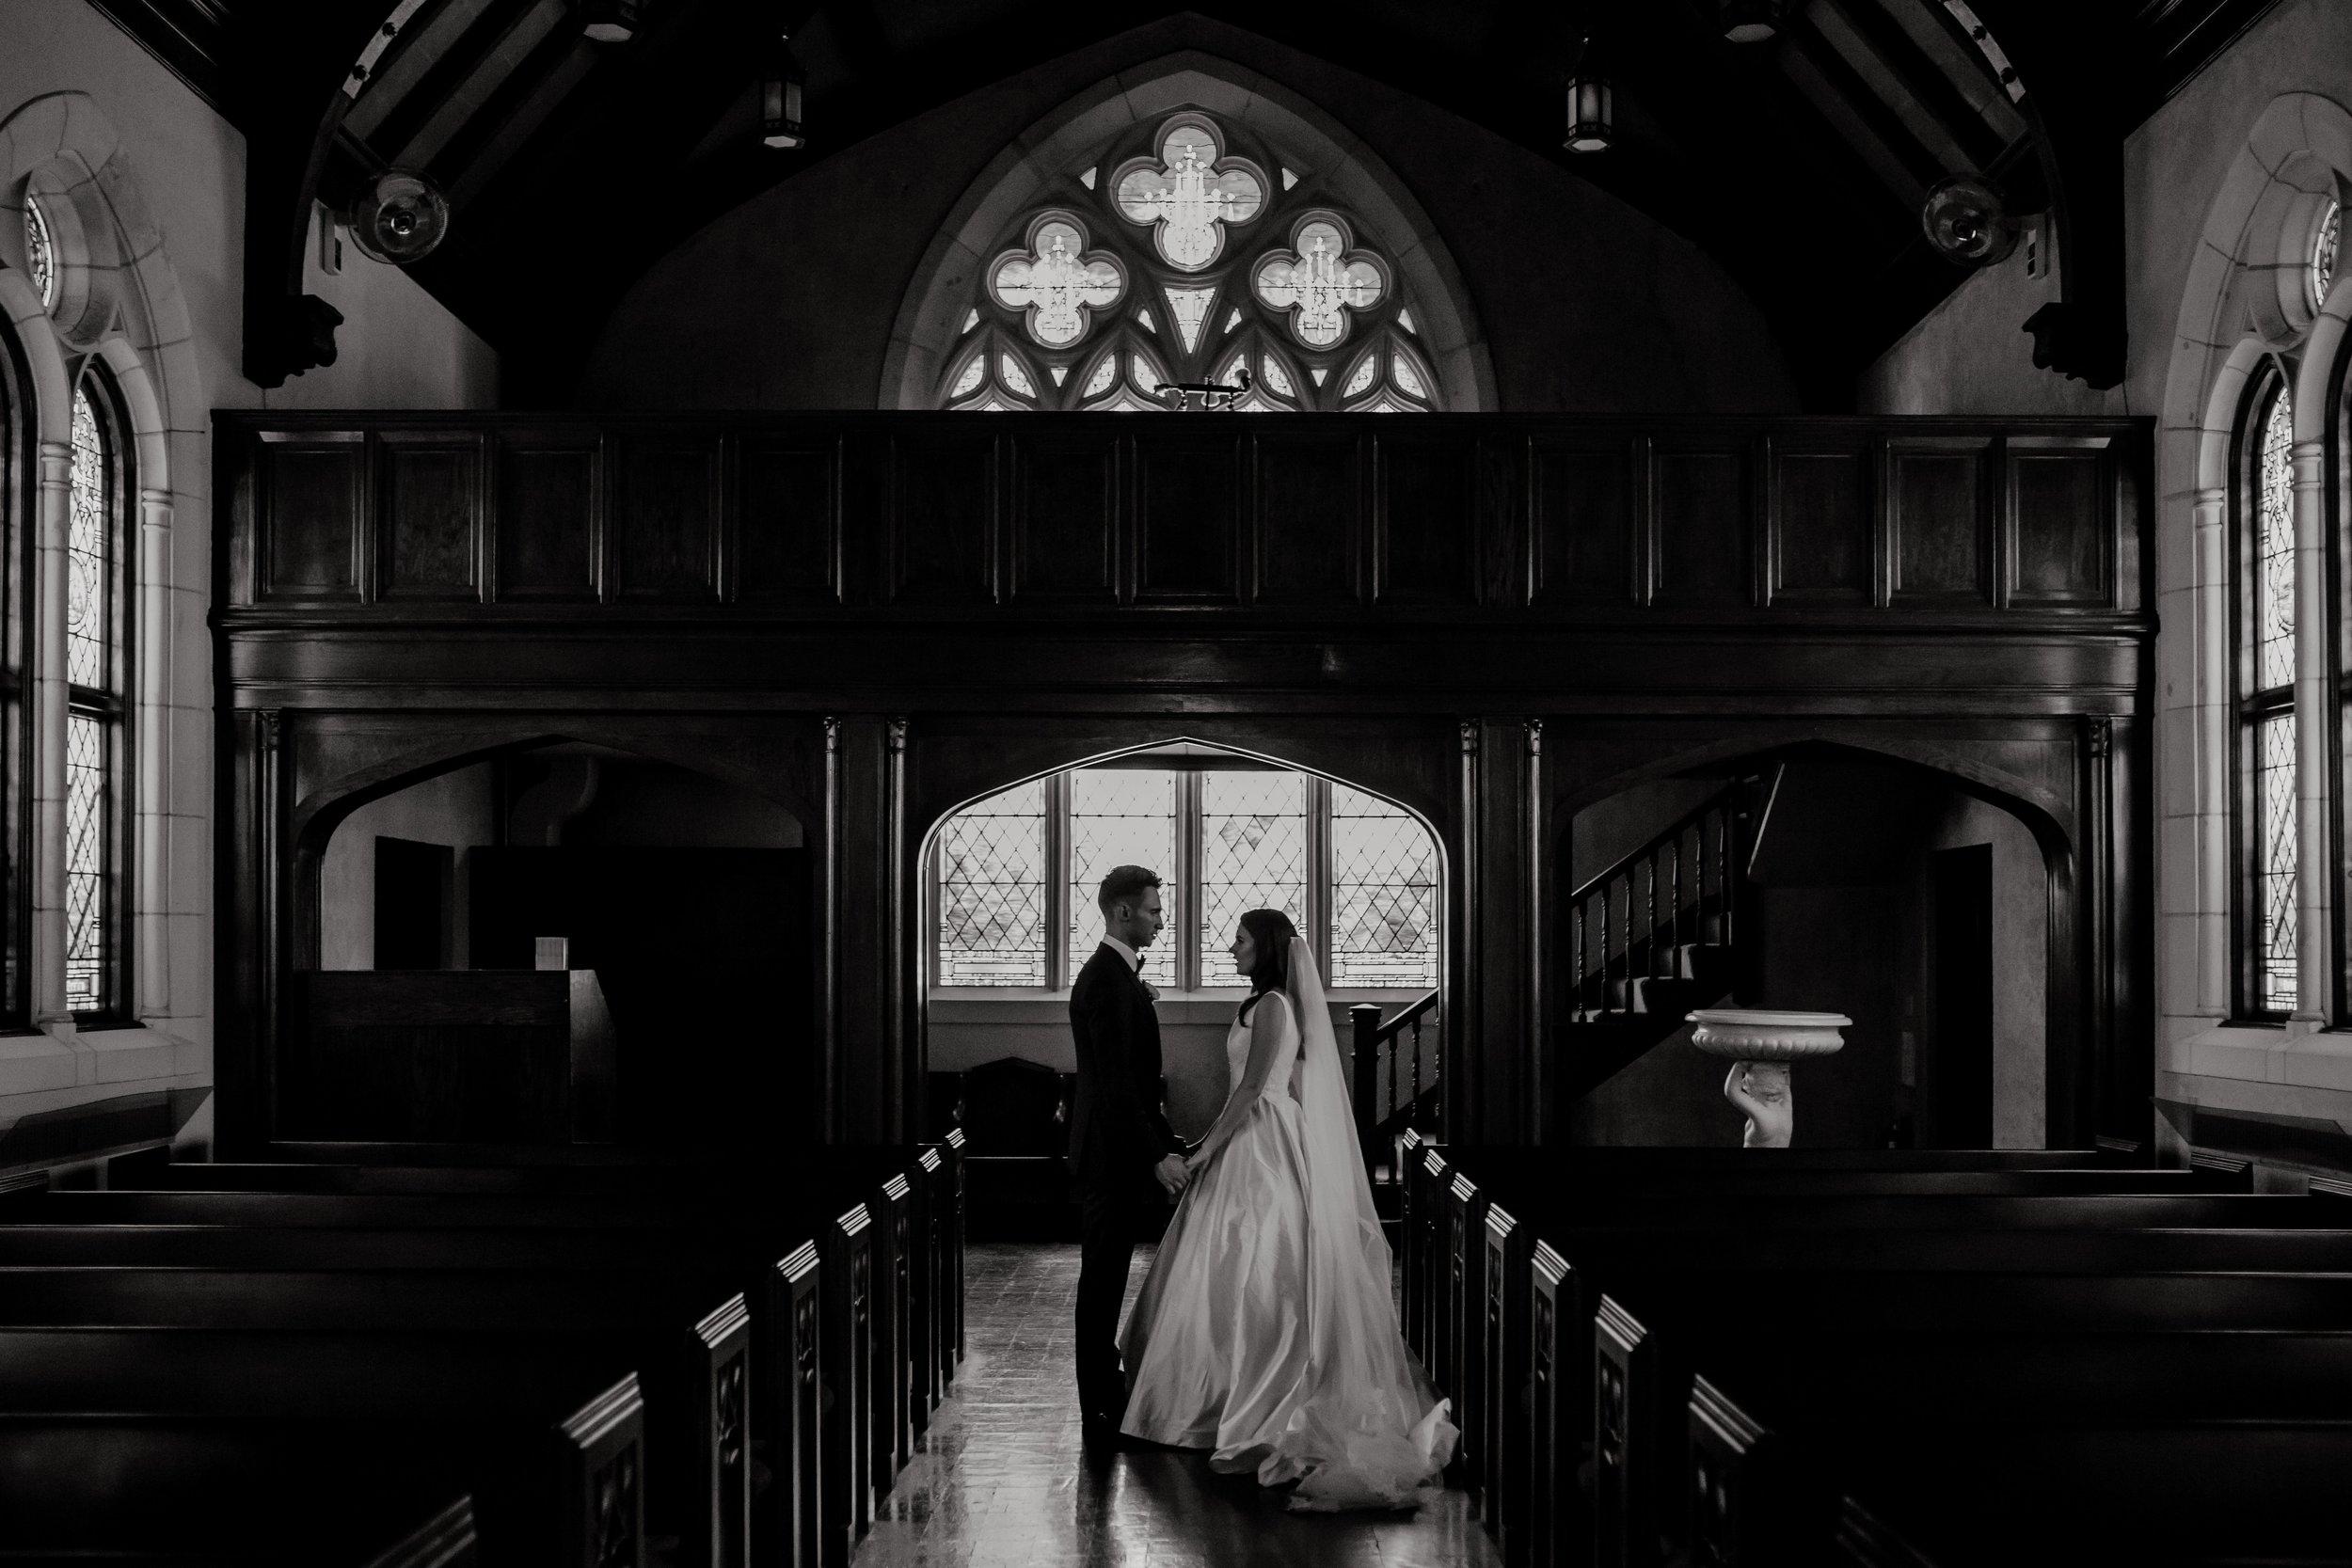 st-anthony-hotel-wedding-photography-10055san-antonio.JPG